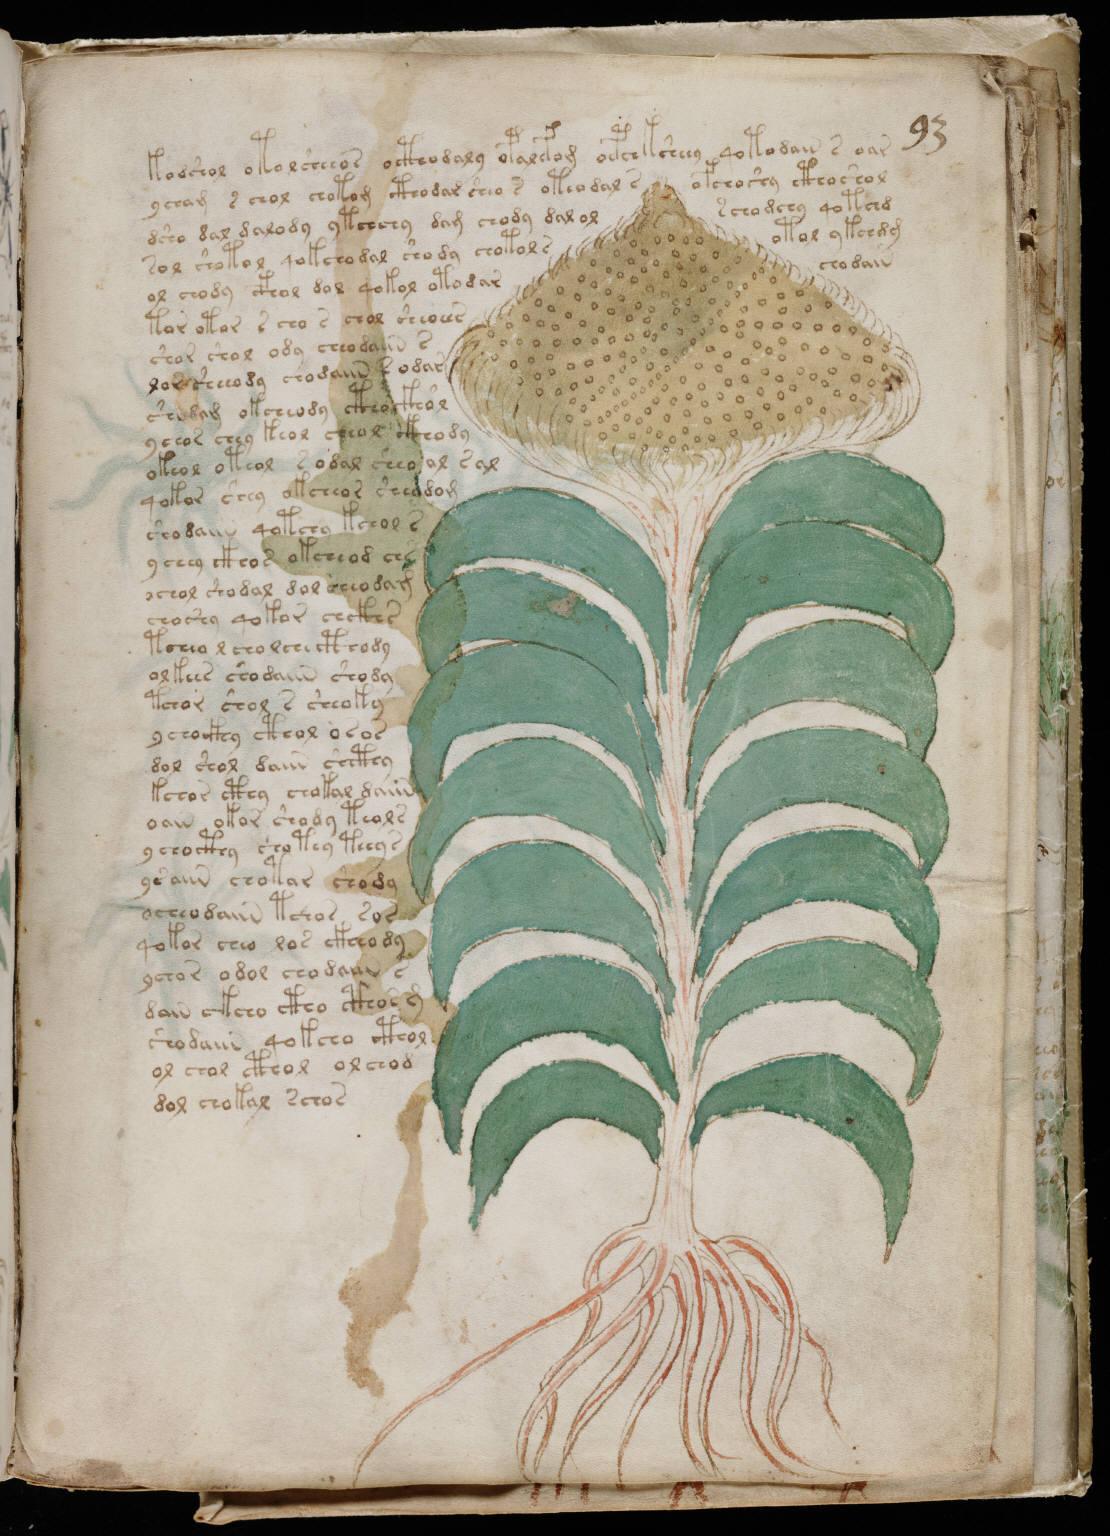 Voynich Manuscript %28167%29 ヴォイニッチ手稿(写本) どの言語にも属さない謎の文字!